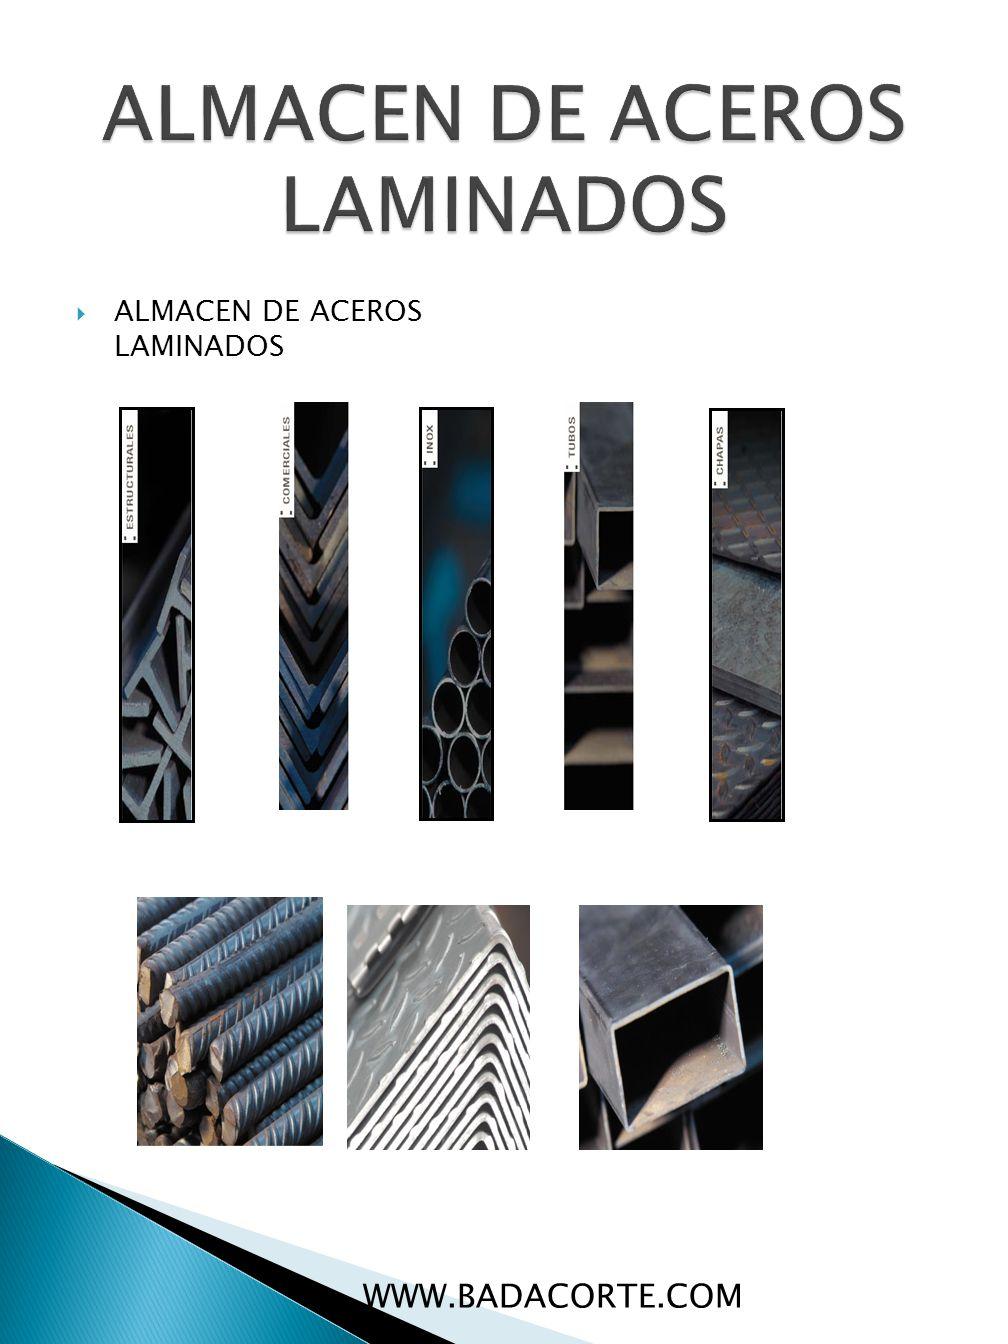 ALMACEN DE ACEROS LAMINADOS WWW.BADACORTE.COM